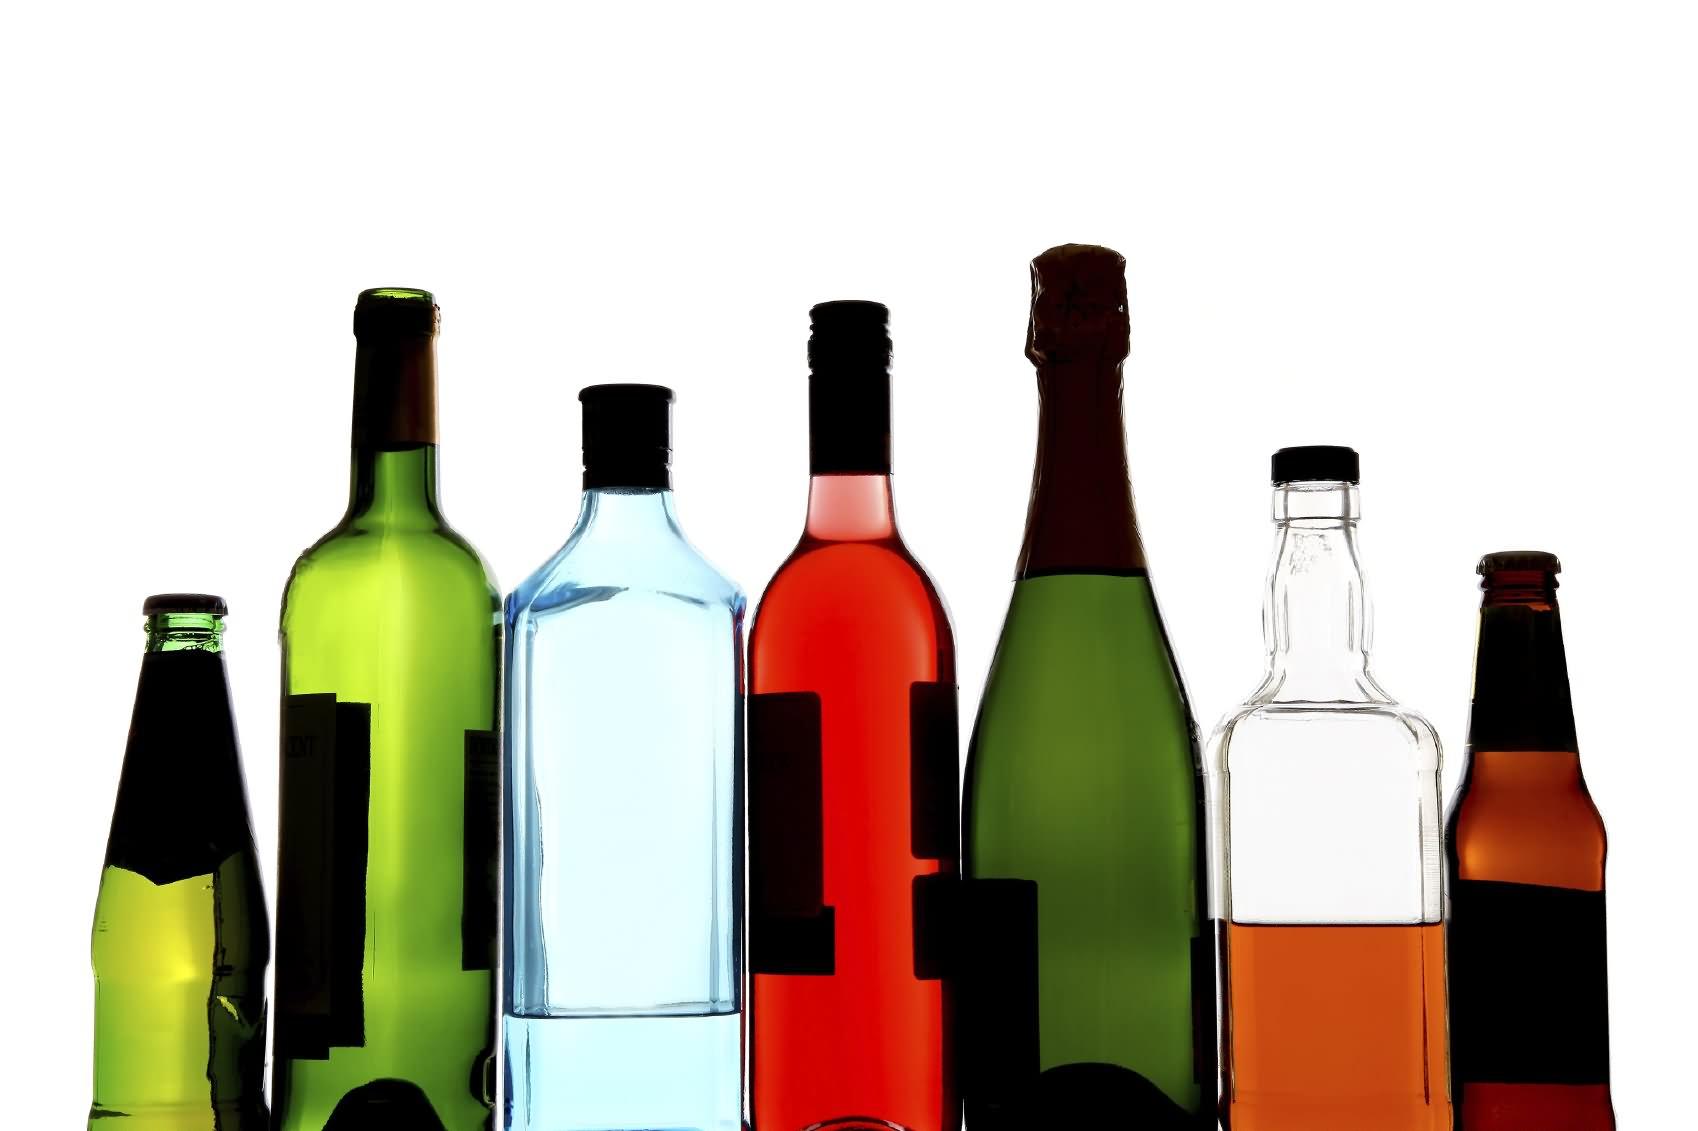 Boose clipart alcohol abuse Alcohol clipart Liquor Alcohol ·